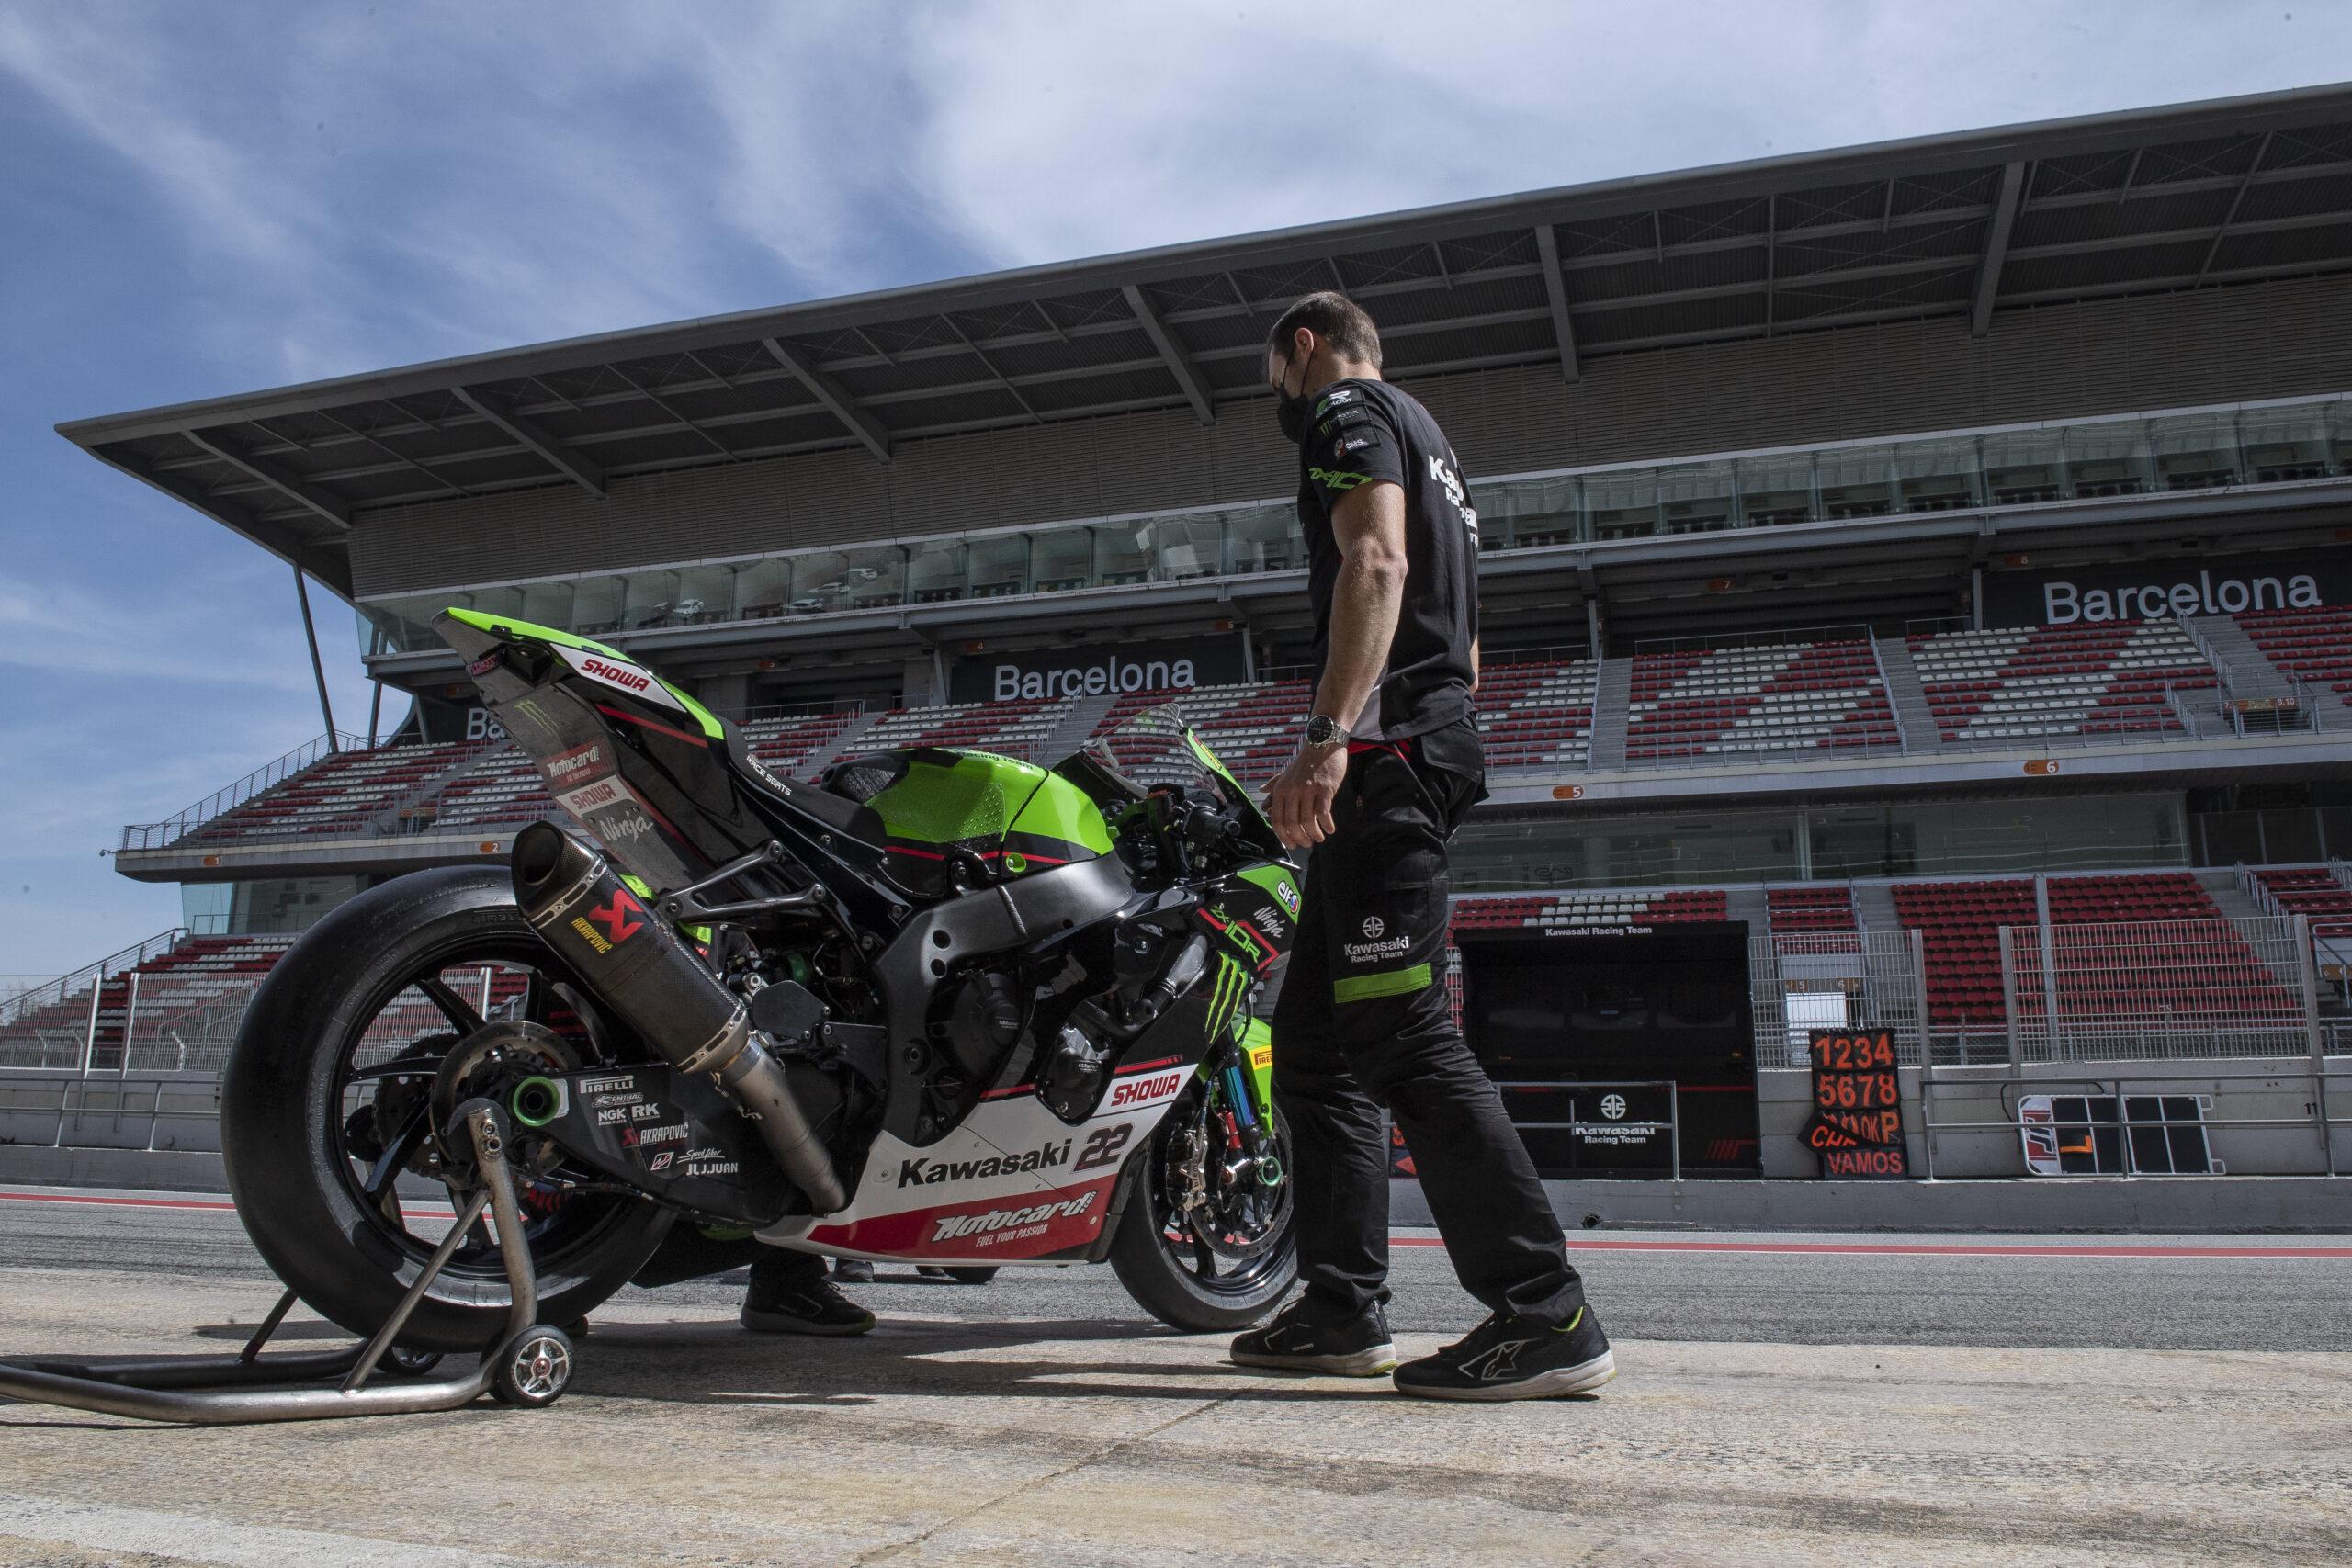 Kawasaki dice presente en el Superbike de San Juan